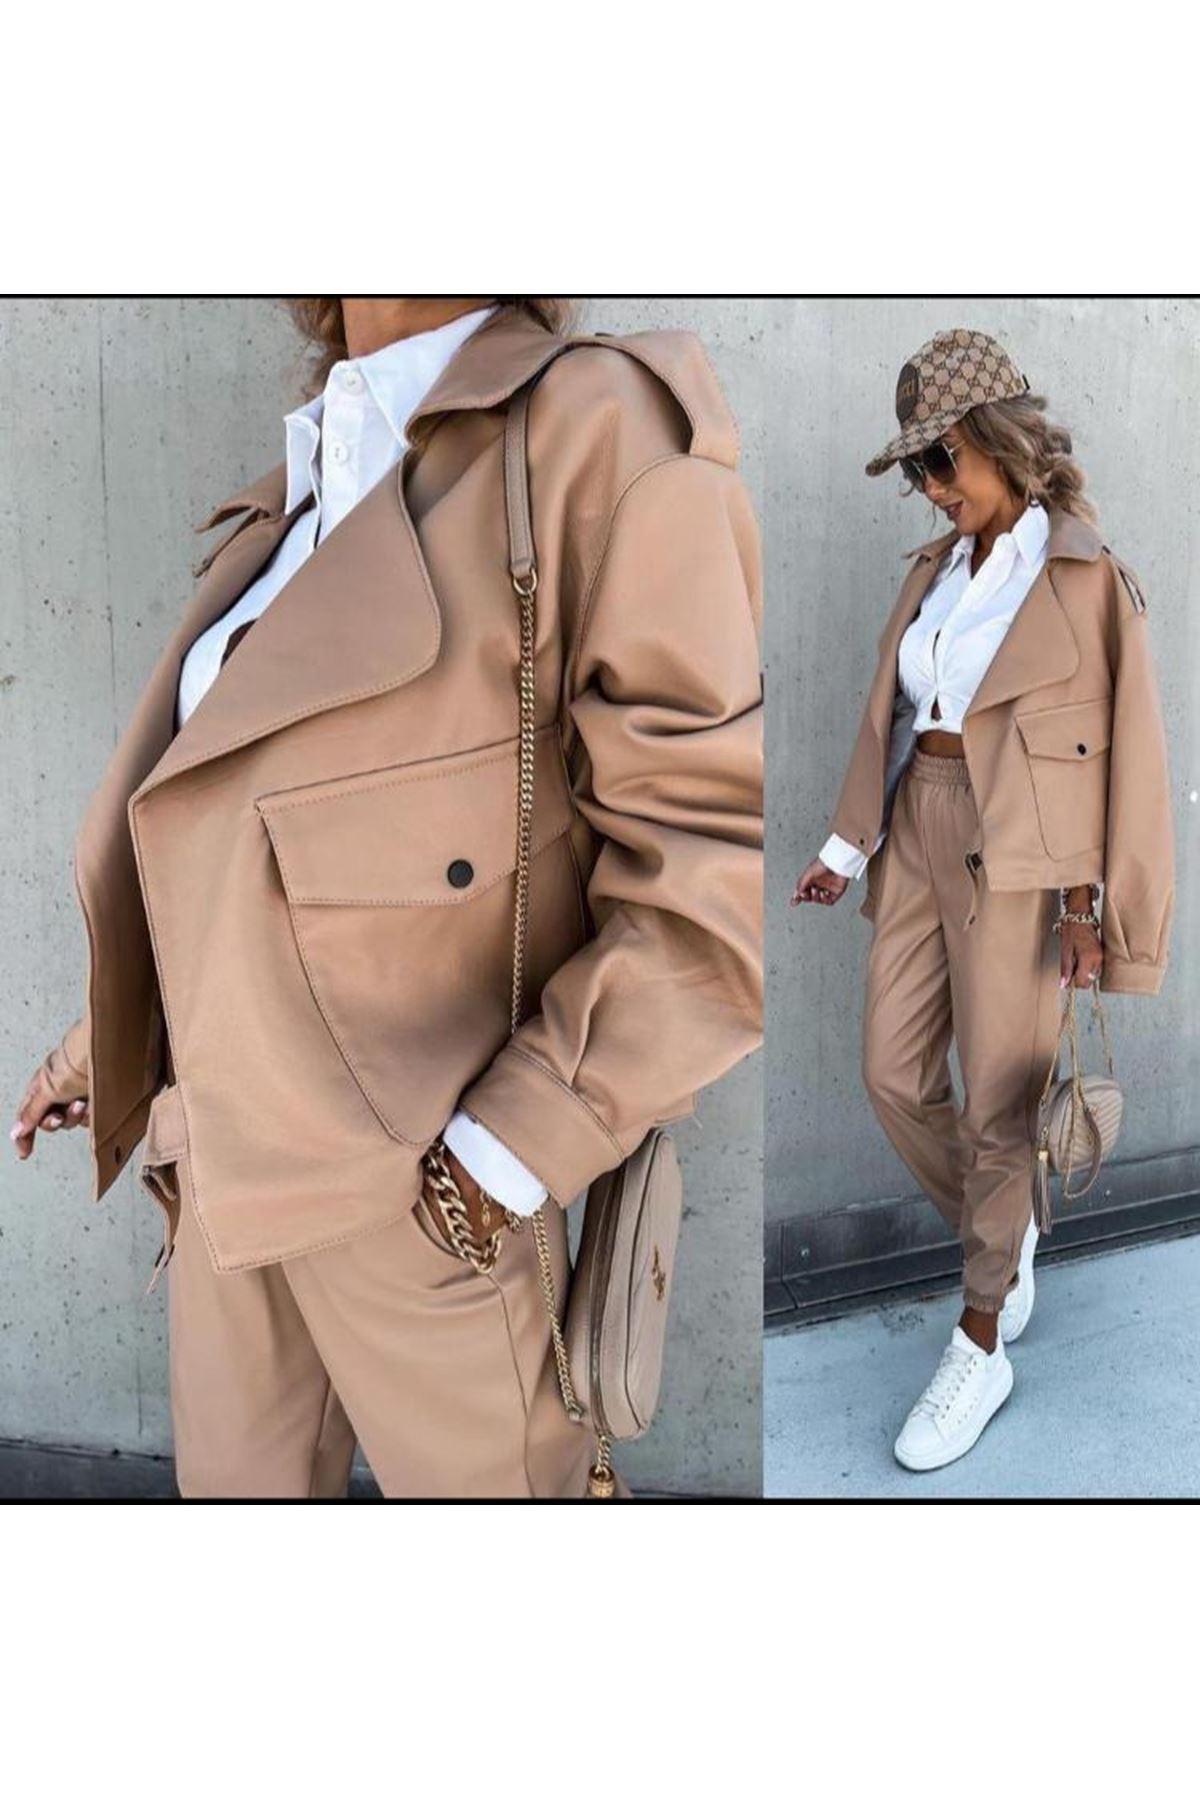 Zara Model Deri Cepli Takım - Vizon